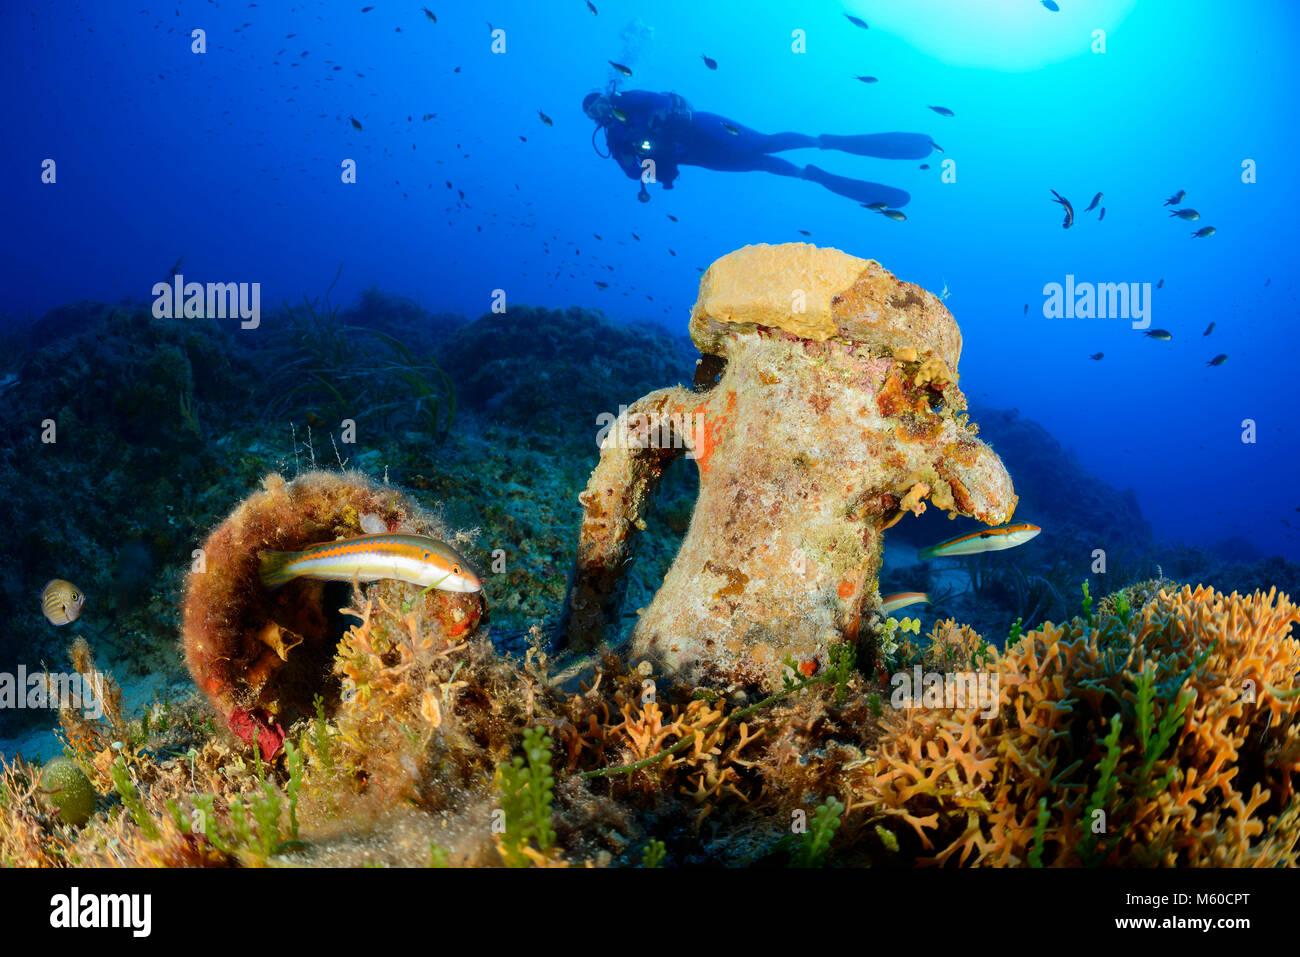 Mediterranean coral reef with Amphora underwater and scuba diver. Adriatic Sea, Mediterranean Sea, Island Lastovo, - Stock Image